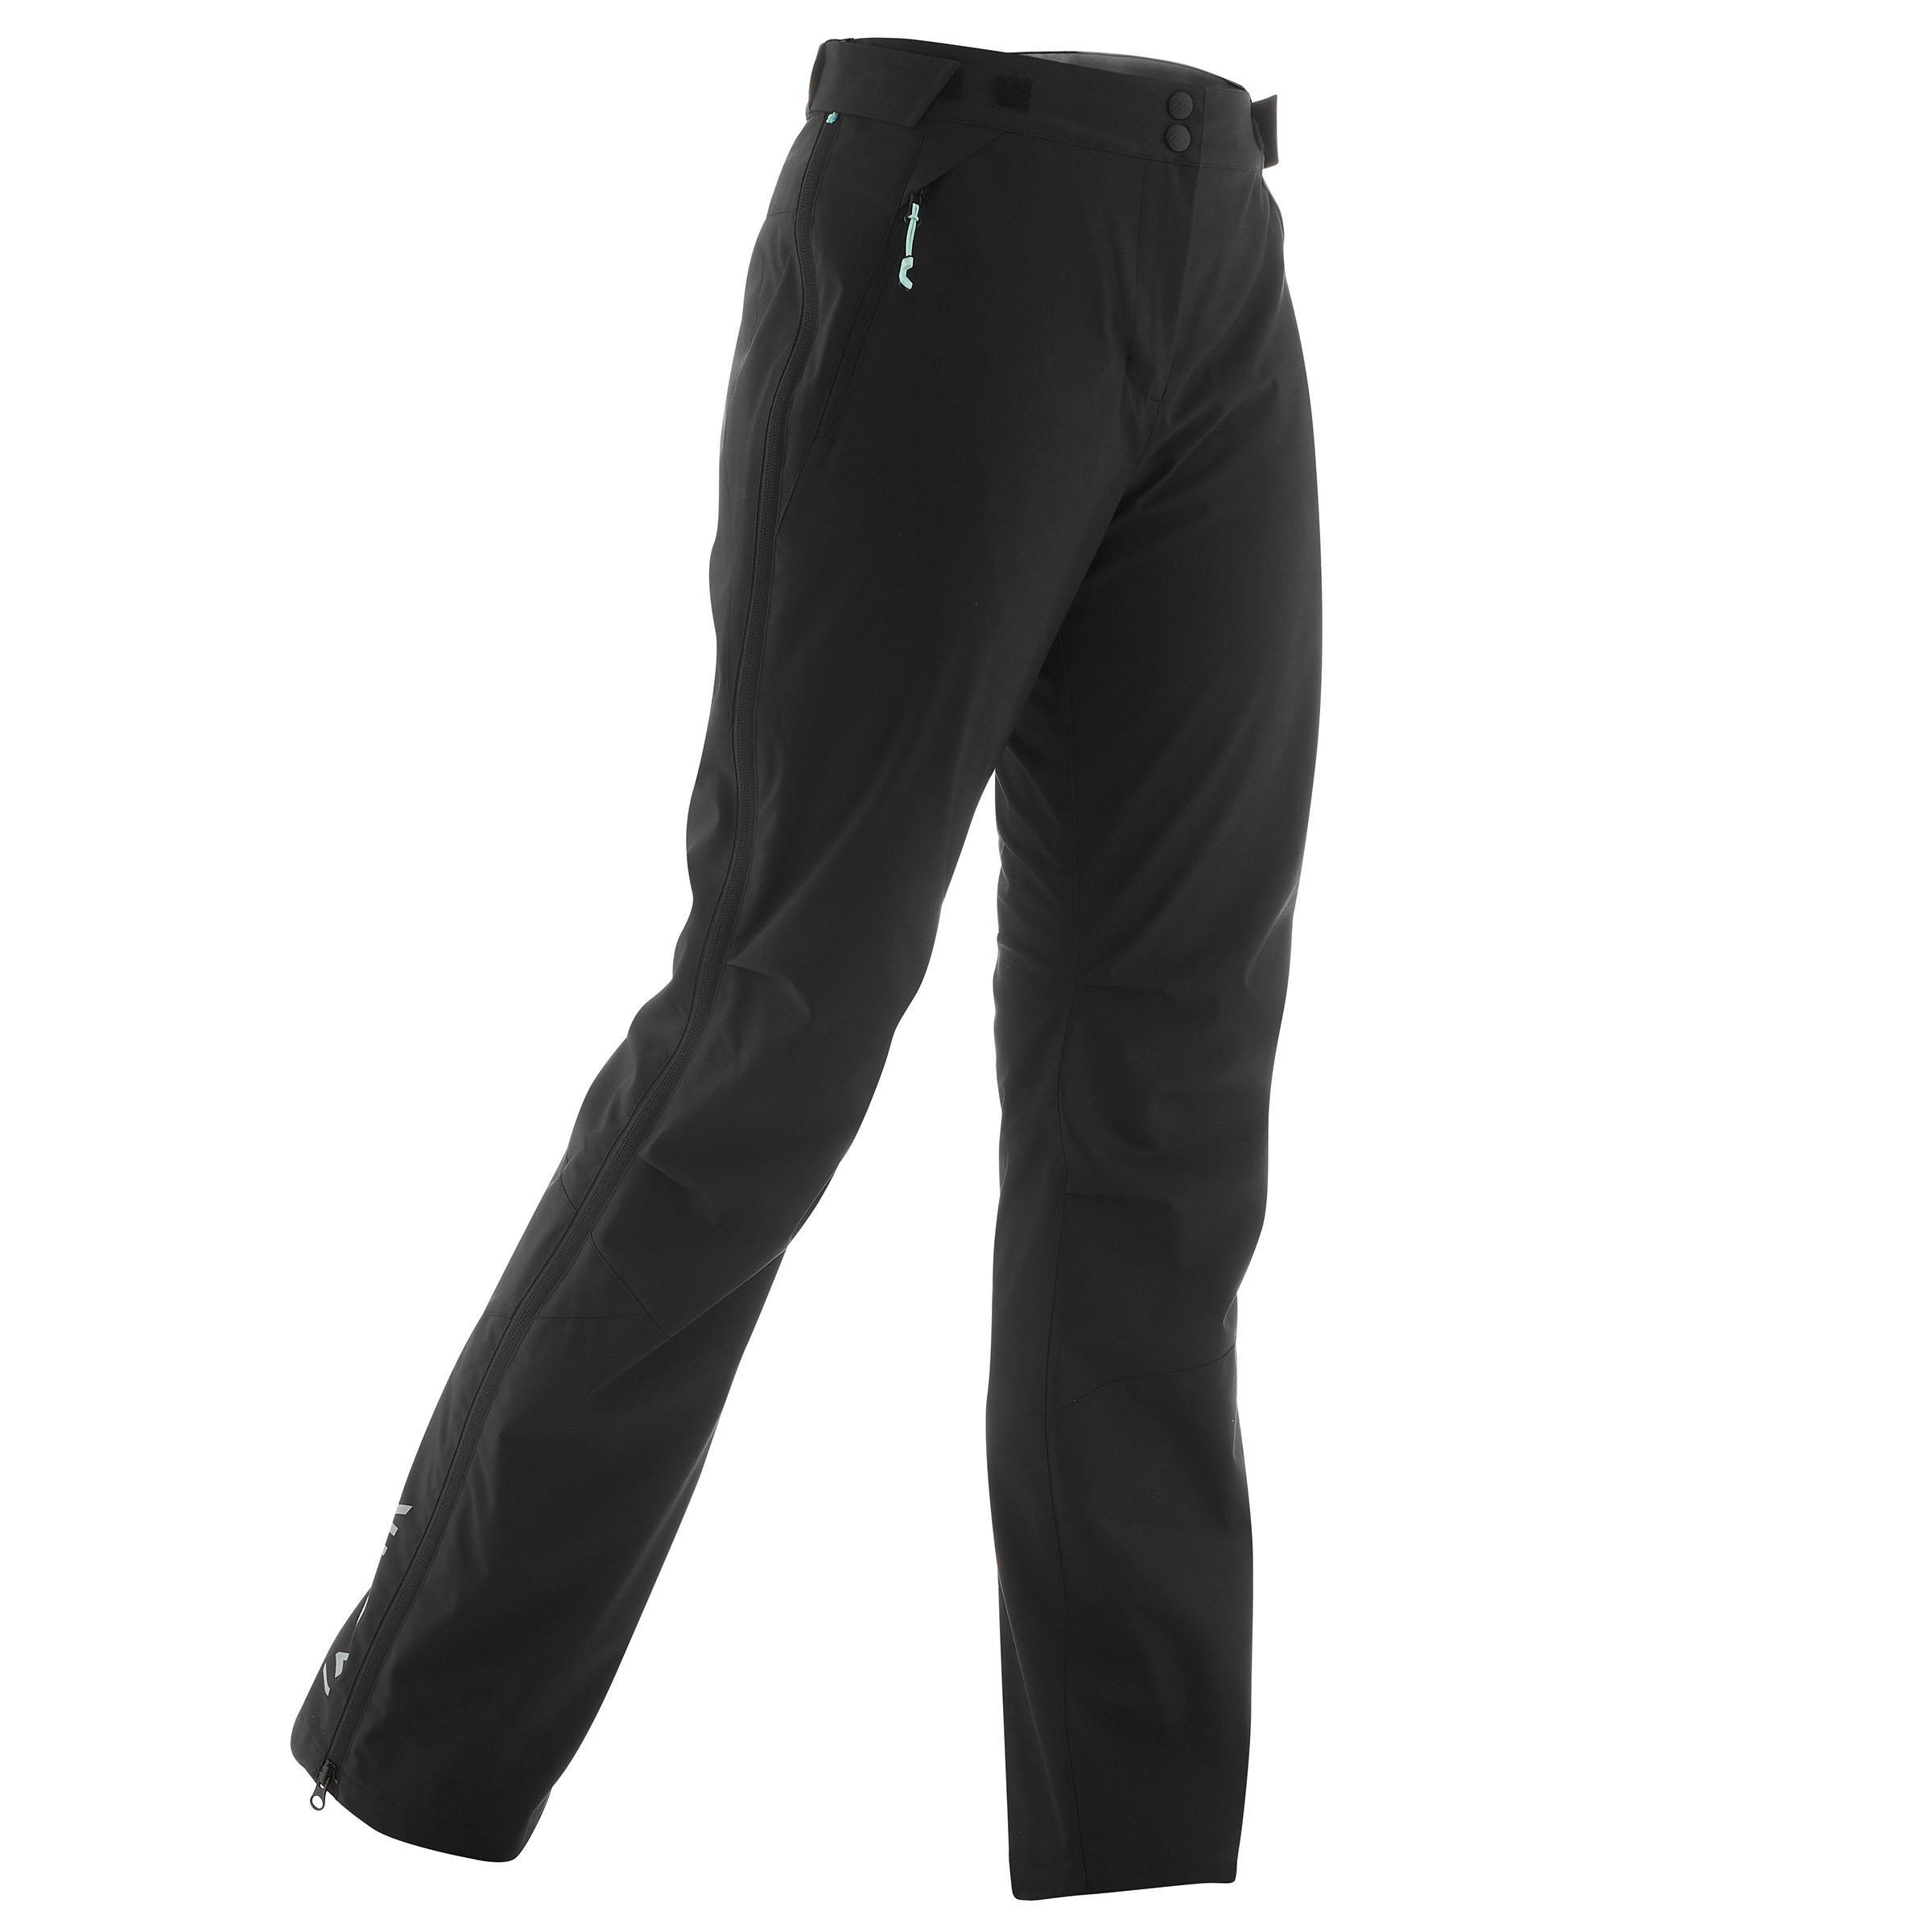 Langlaufhose XC S 150 Überhose Damen   Sportbekleidung > Sporthosen > Laufhosen   Inovik